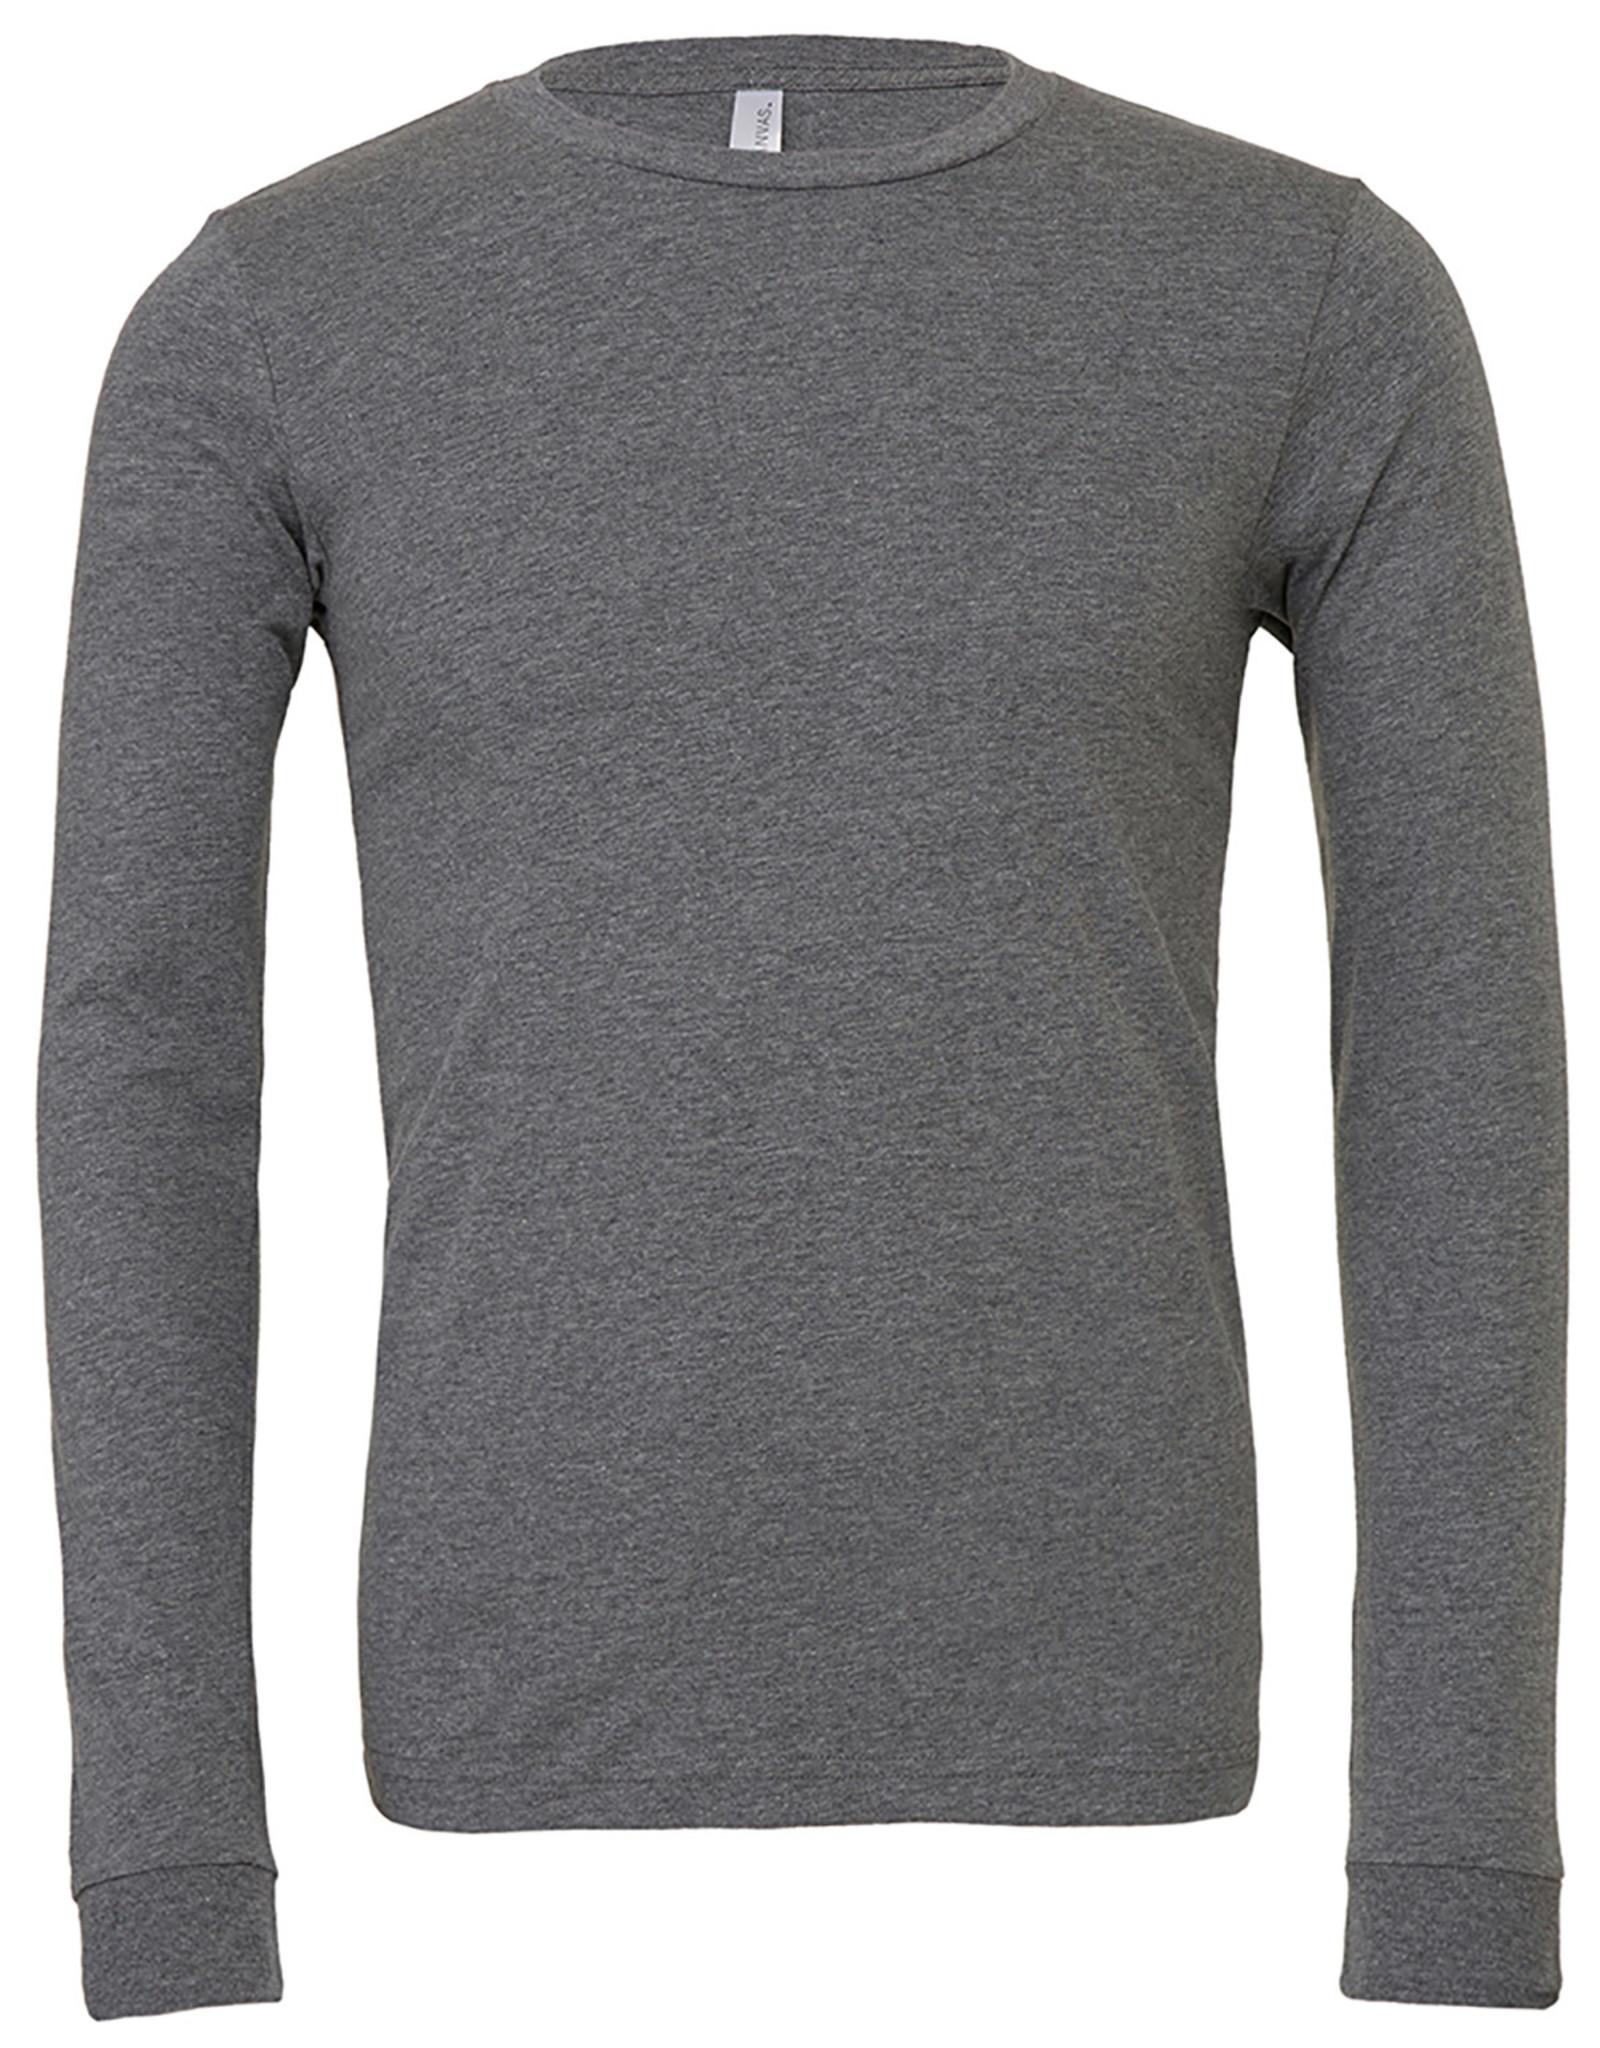 NON-UNIFORM SHIRT - Long Sleeve Custom Shirt, custom